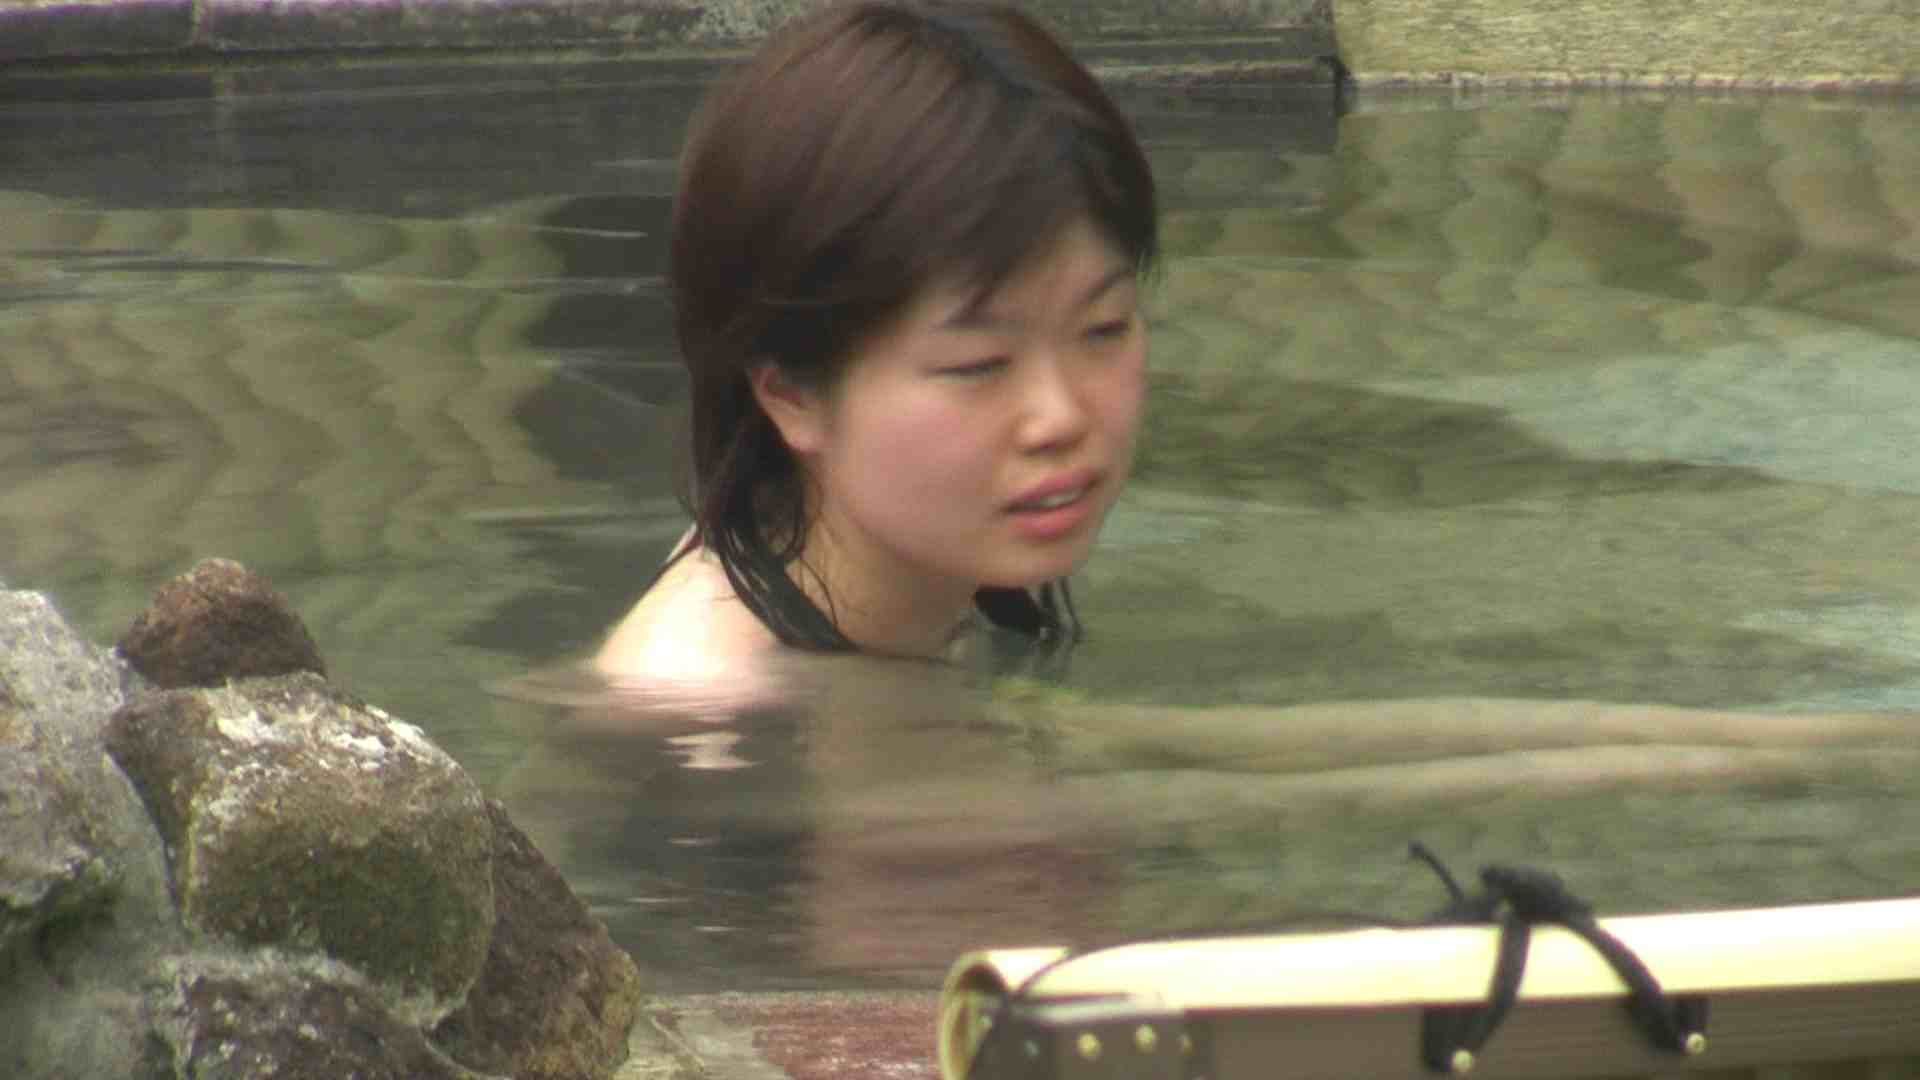 Aquaな露天風呂Vol.675 露天 オマンコ無修正動画無料 10pic 5